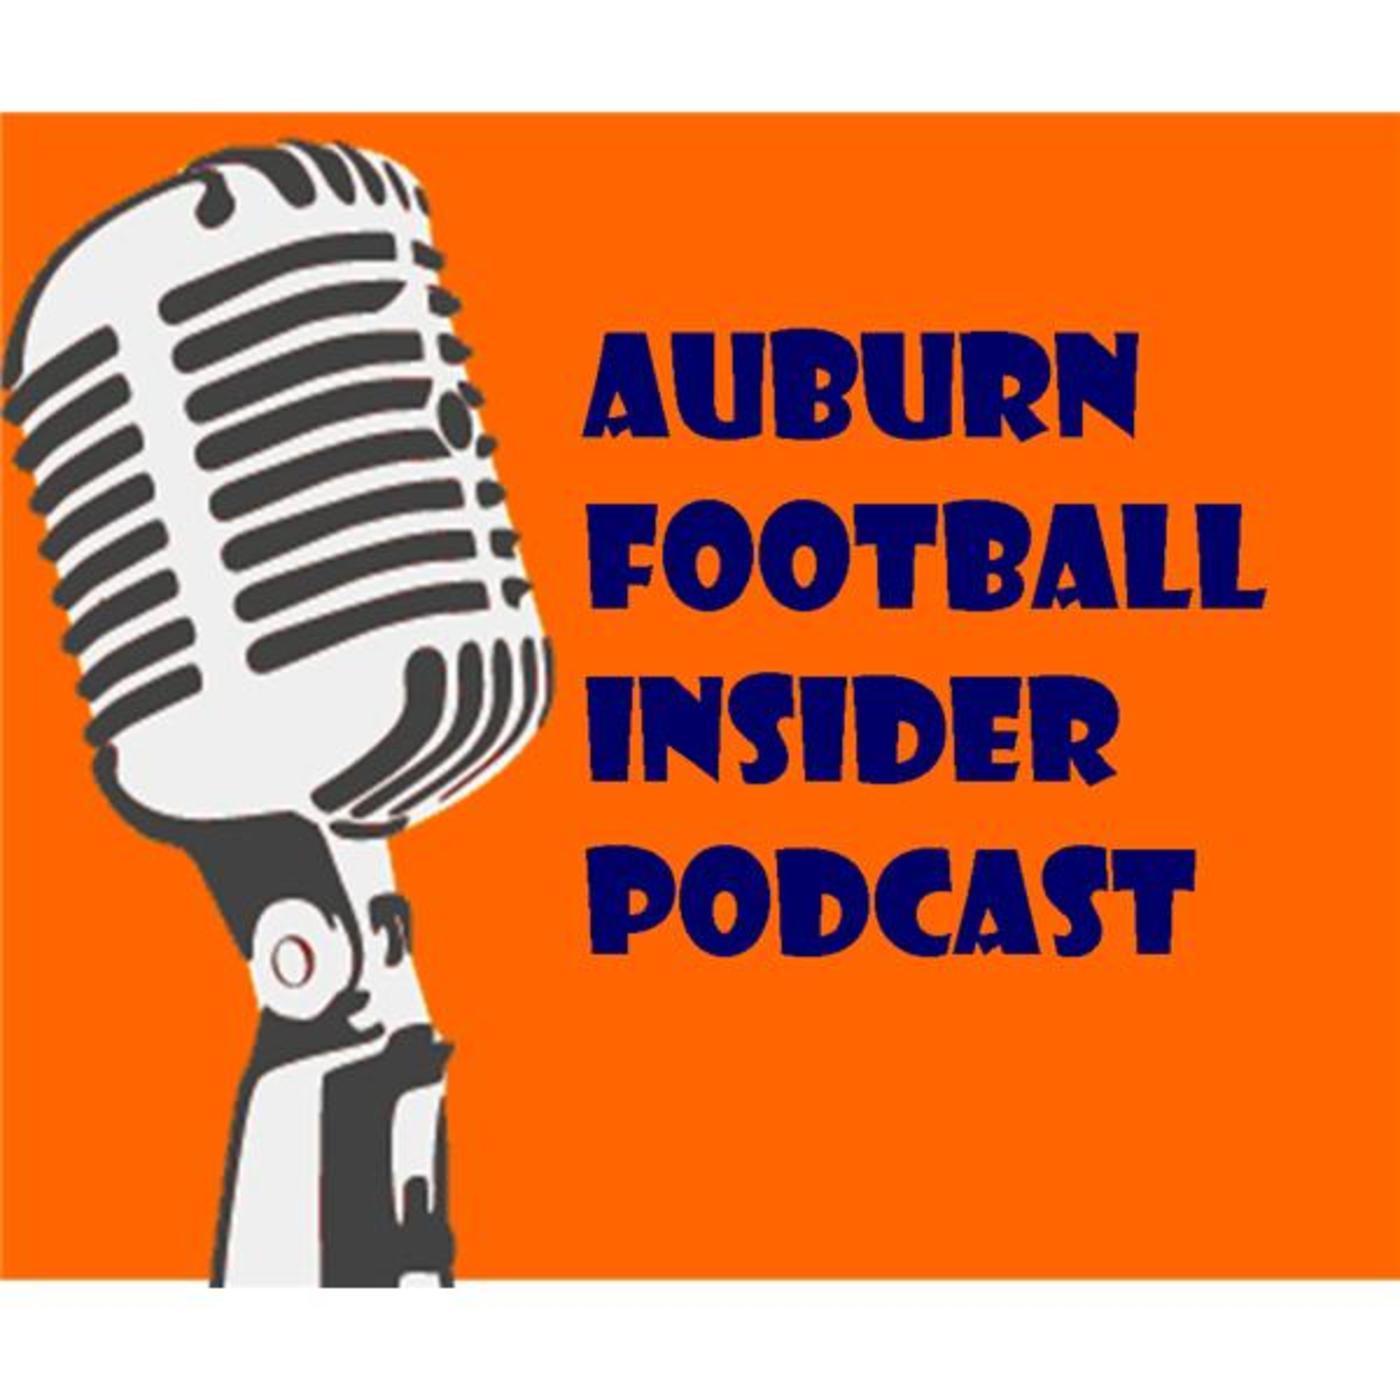 Auburn Football Insider Podcast